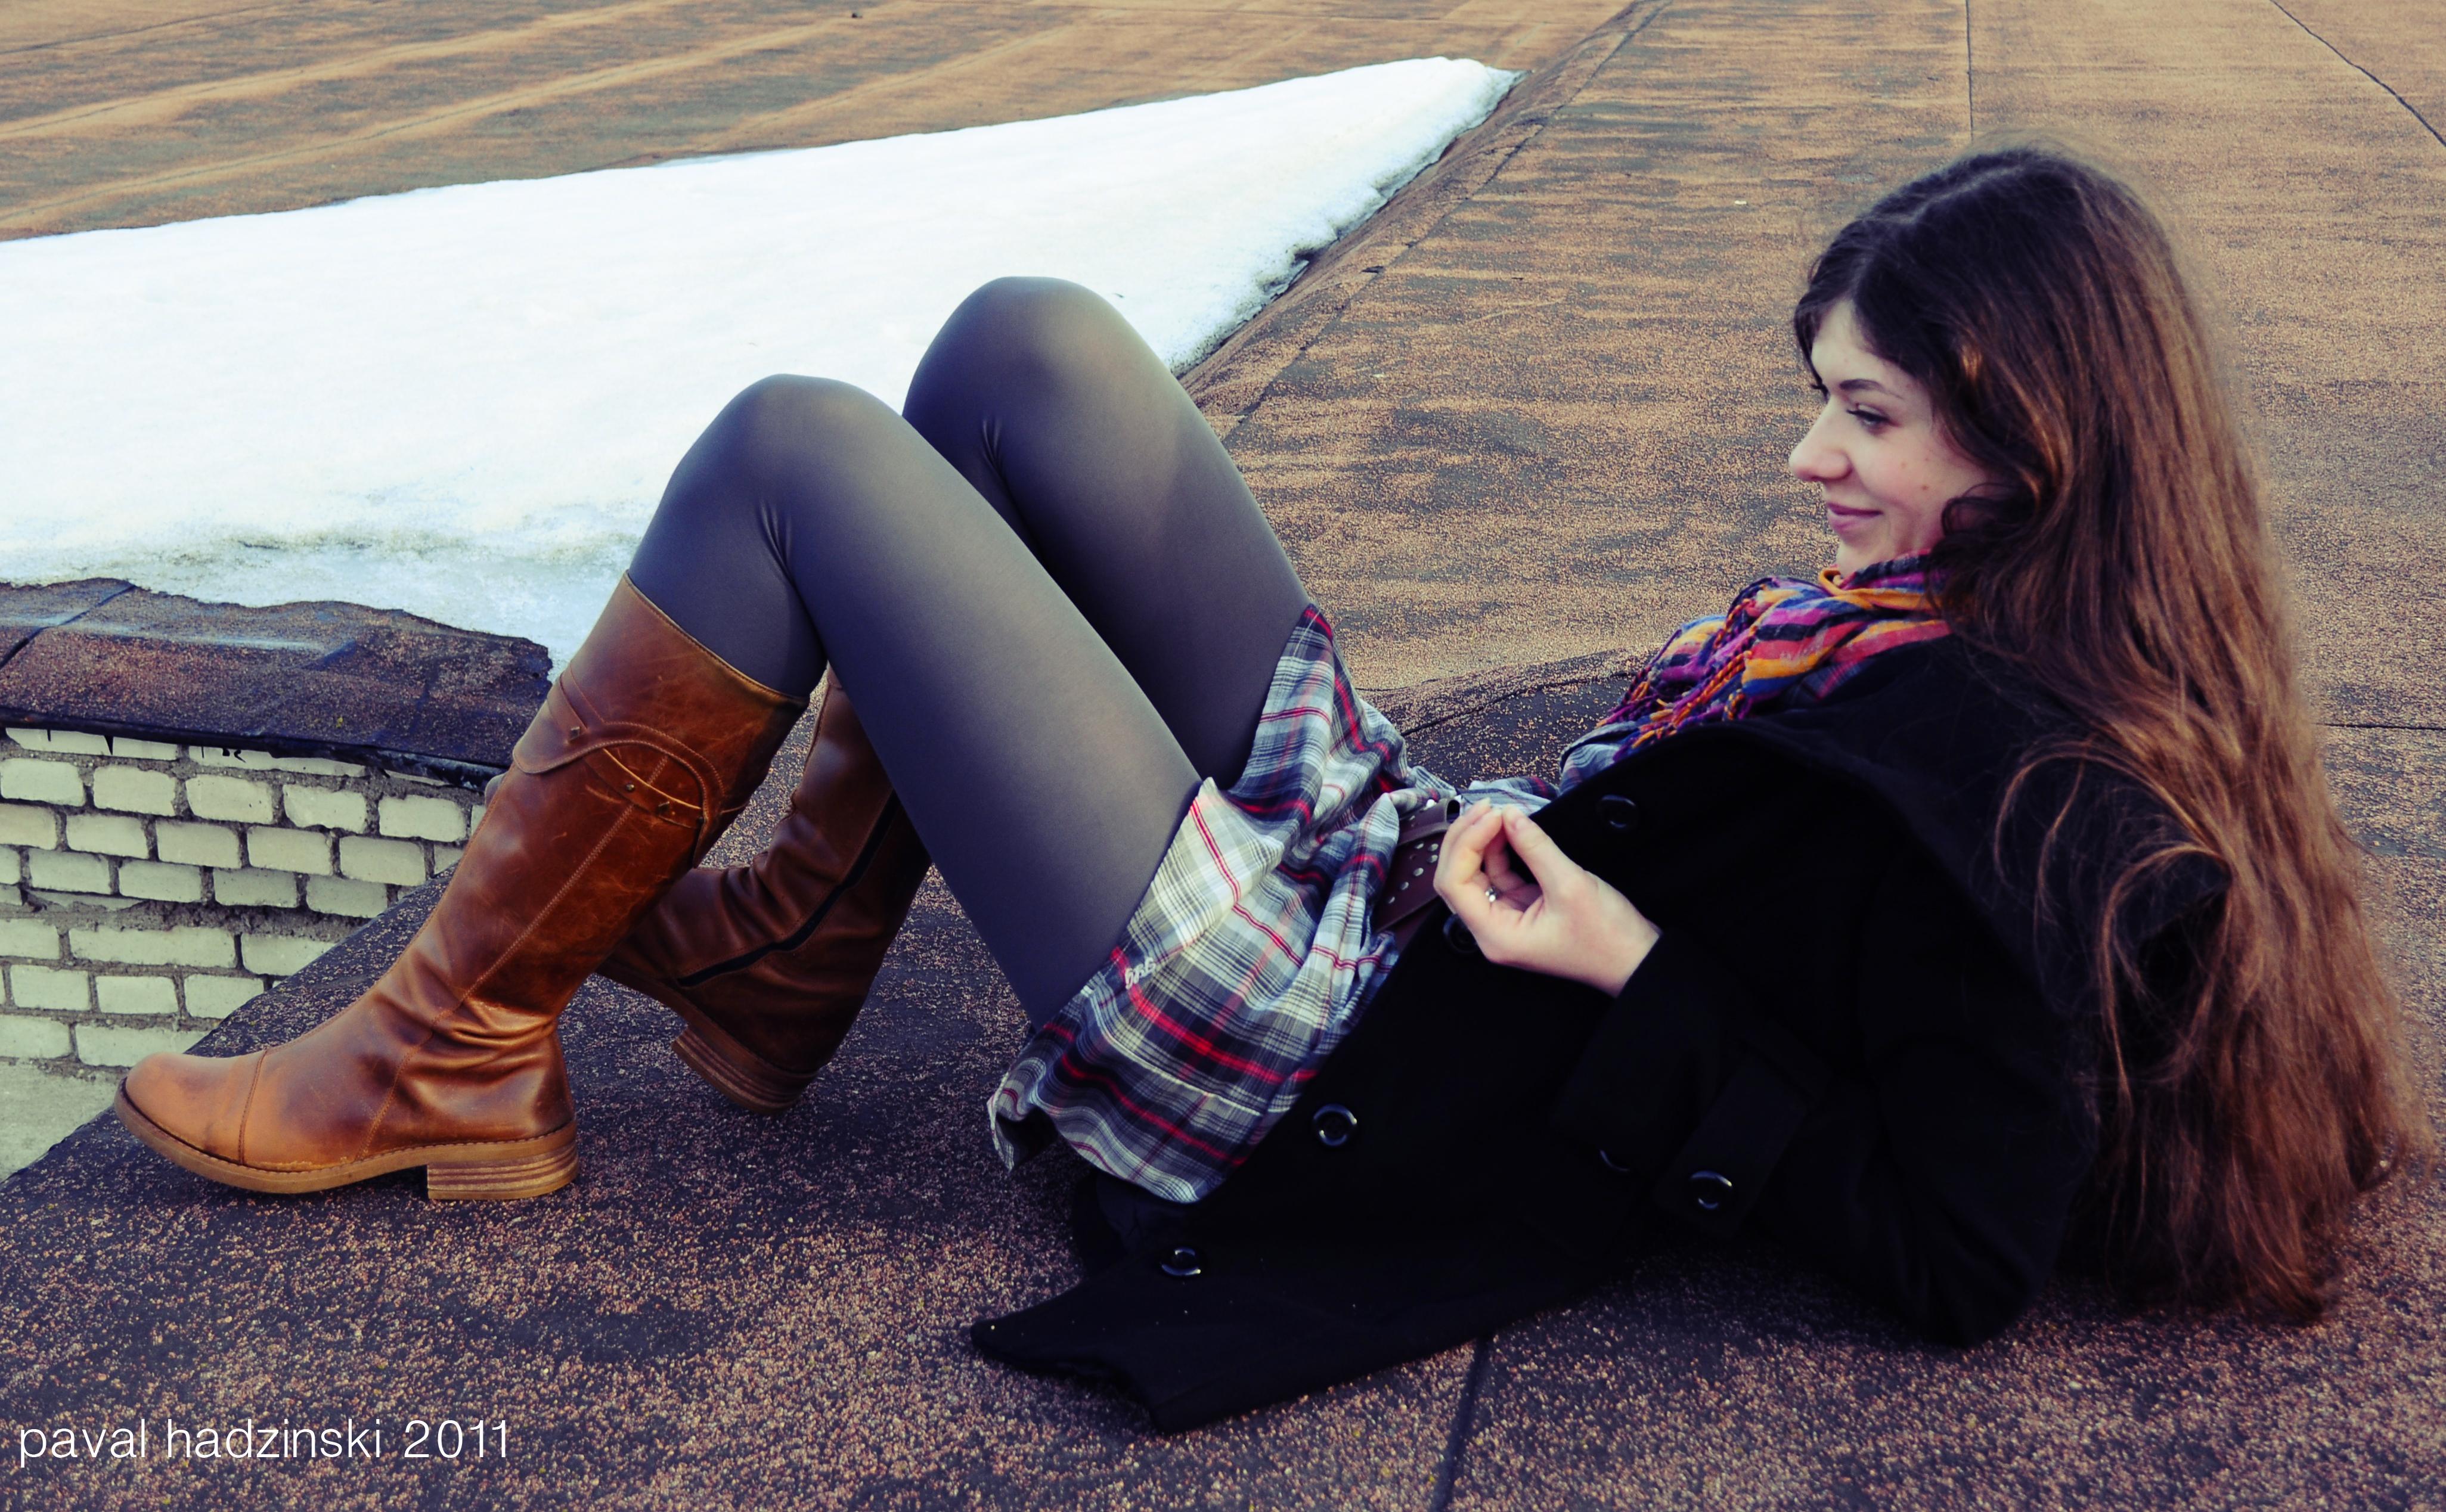 Wallpaper People Women Model Portrait City Street Long Hair Urban Sitting Pantyhose Black Nikon Tights ART Light Pretty Girl Beauty